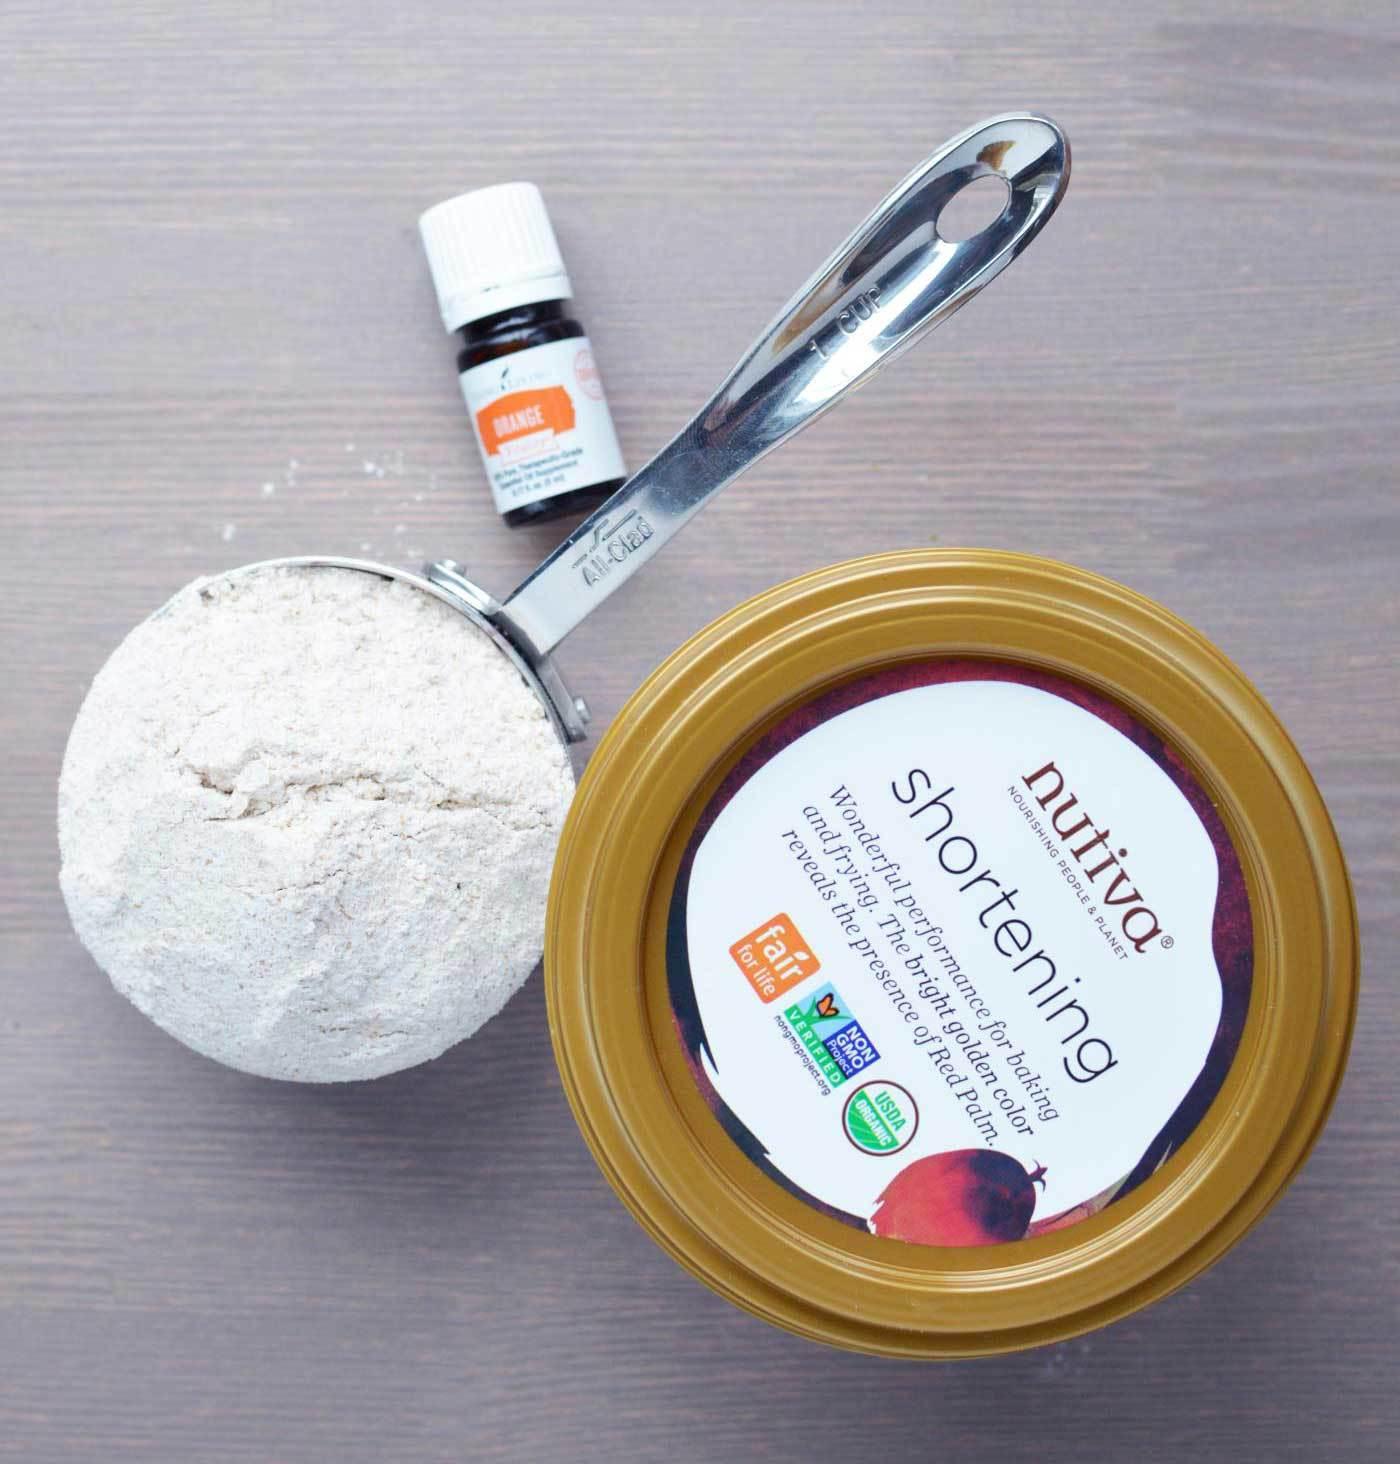 Vegan Shortbread with Young Living Orange Vitality essentil oil via @skimbaco